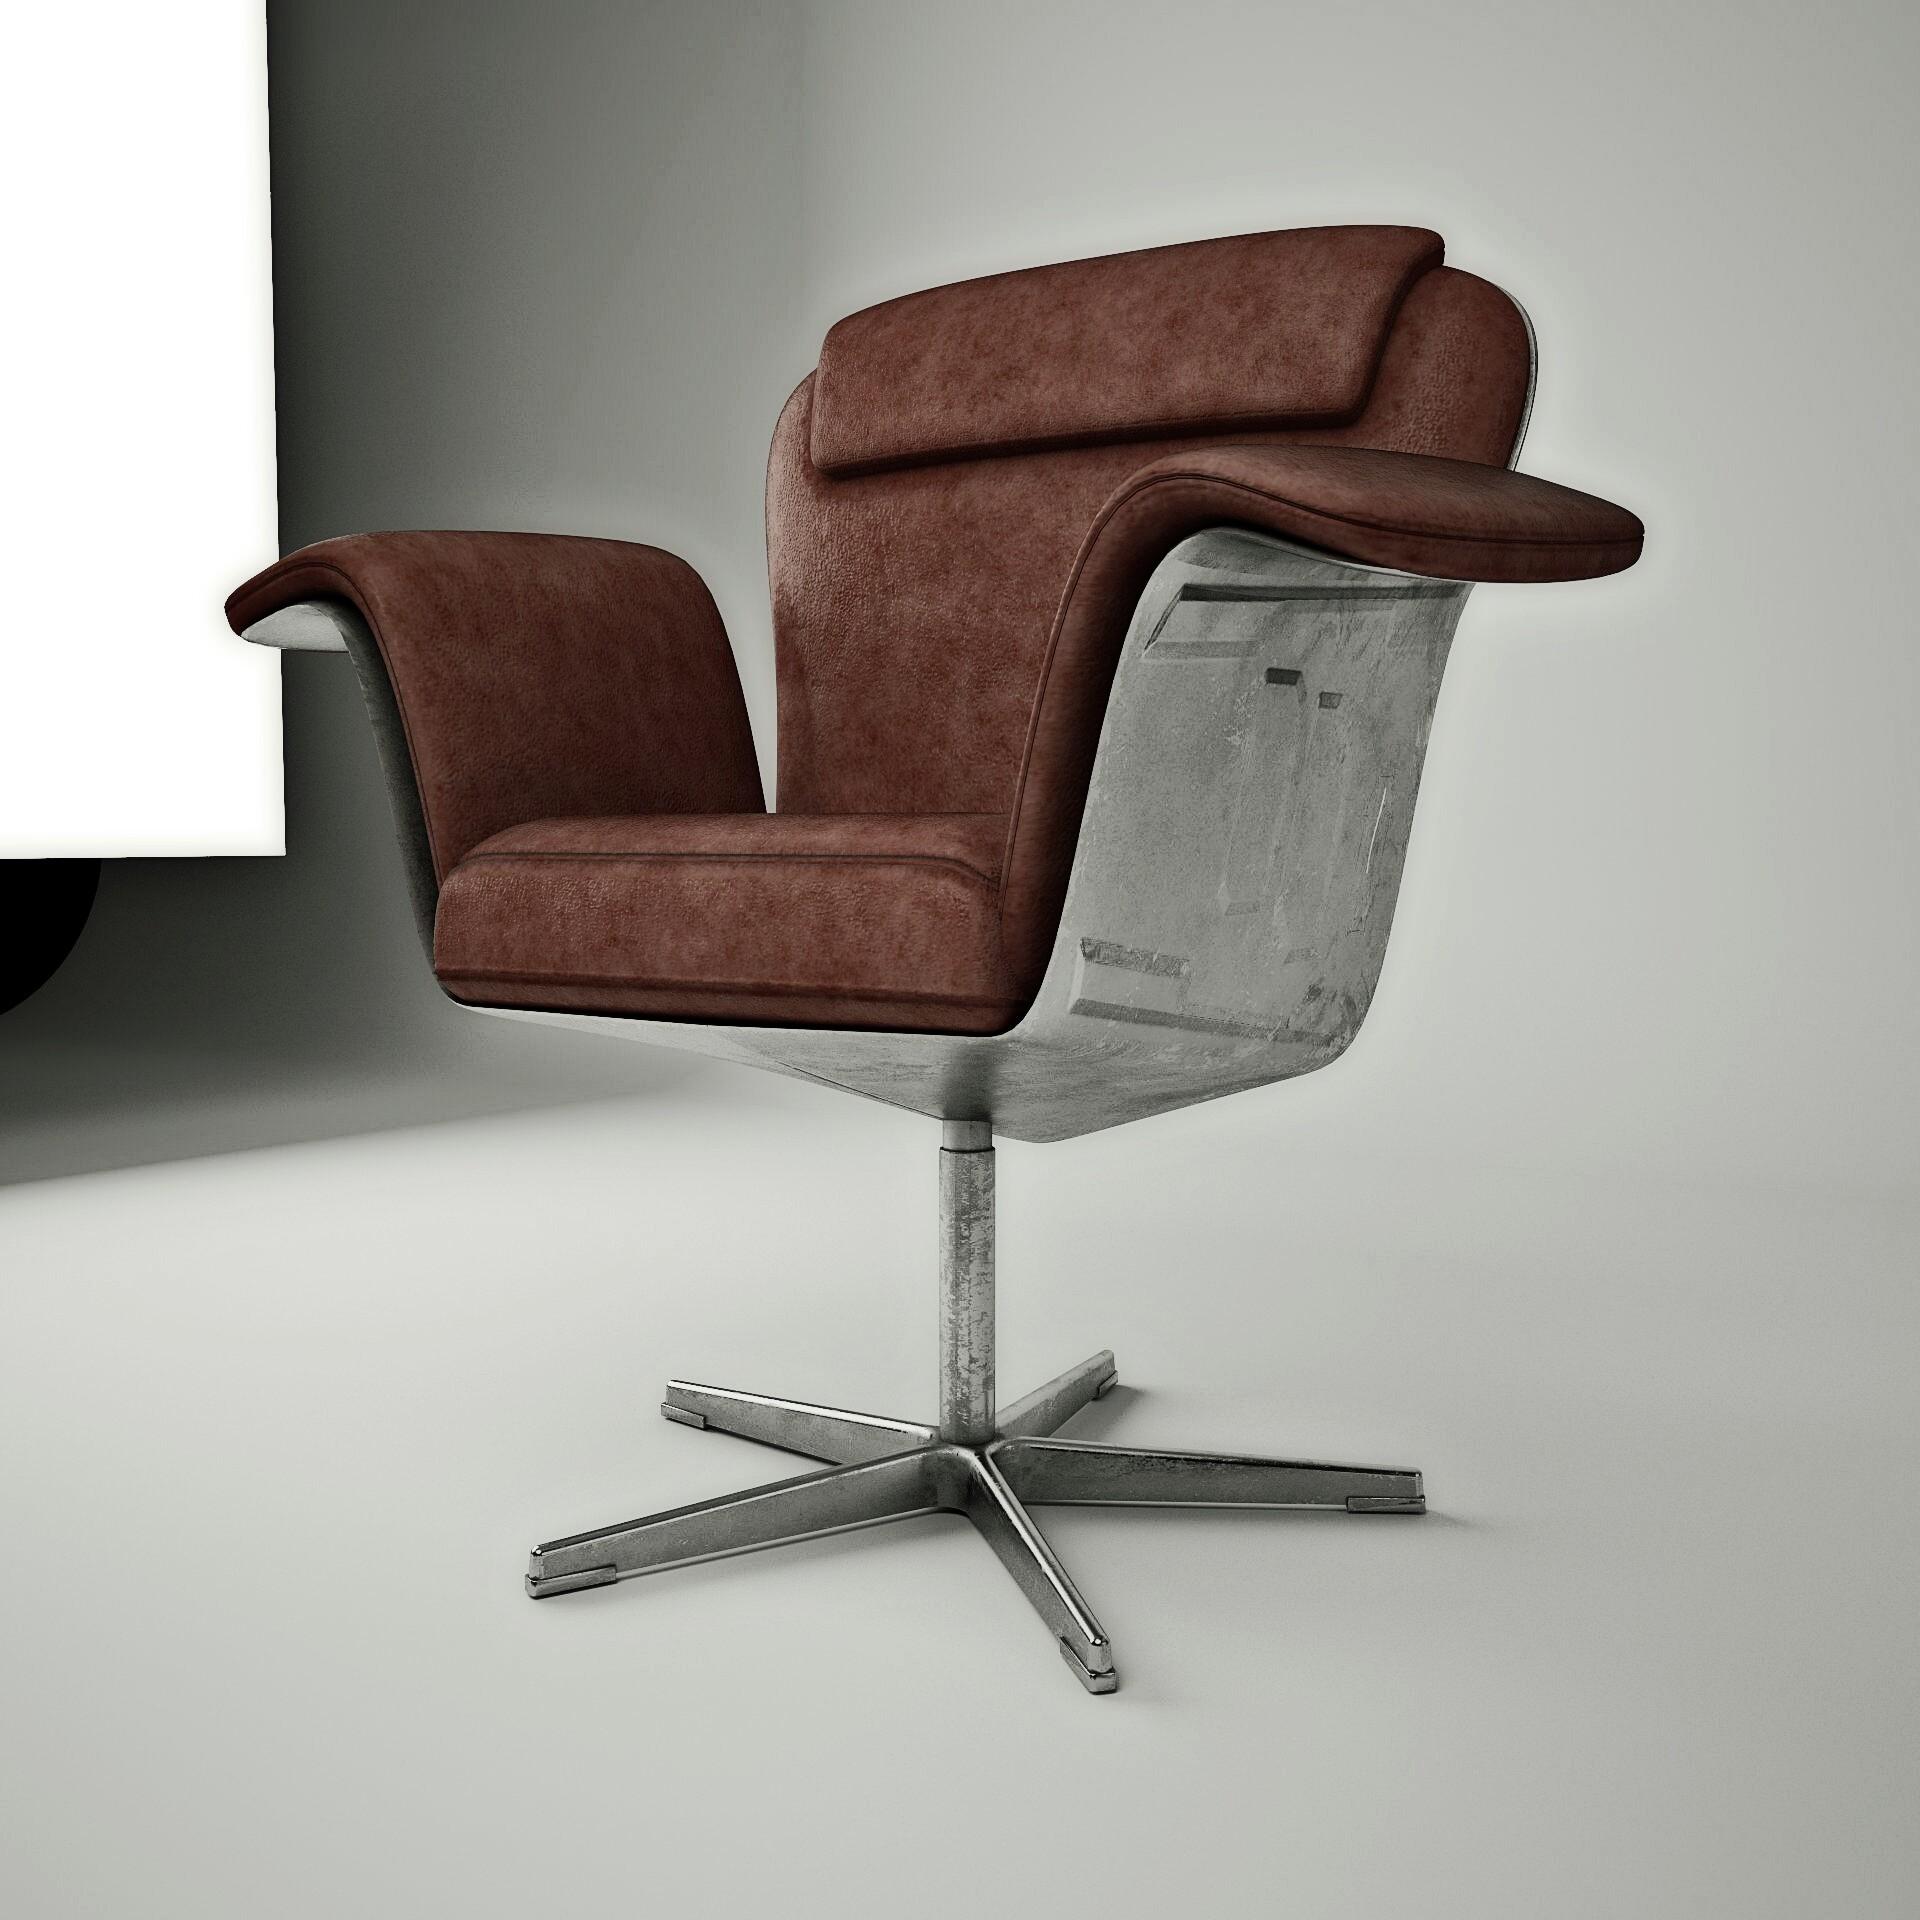 Remarkable Artstation Zsolt Molnars Submission On Nvidia Metropia Ibusinesslaw Wood Chair Design Ideas Ibusinesslaworg